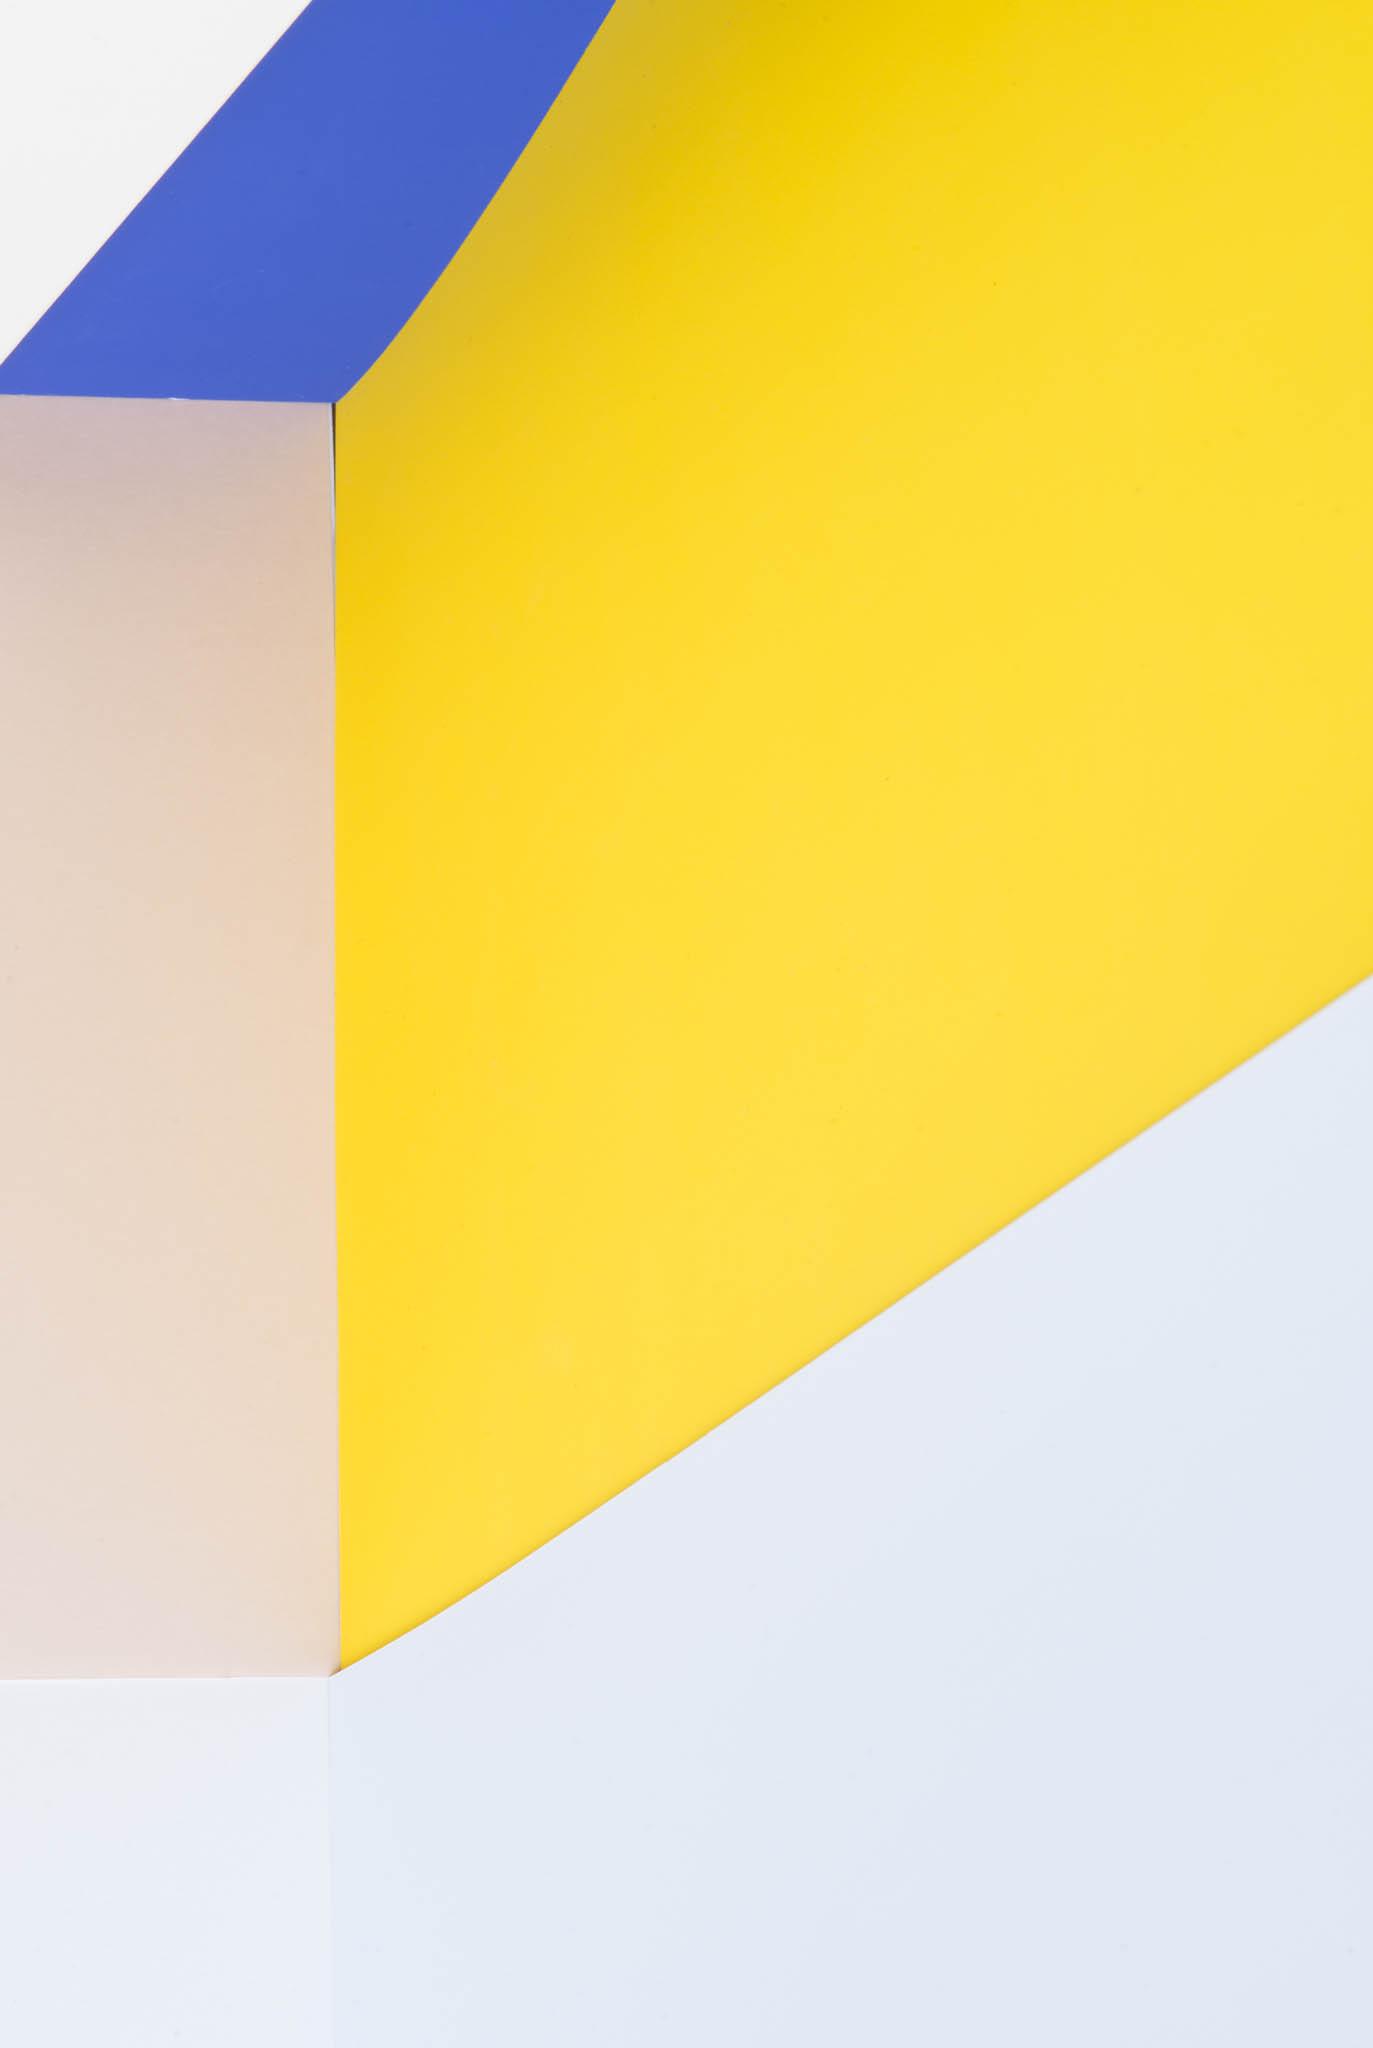 squarespace-4.jpg